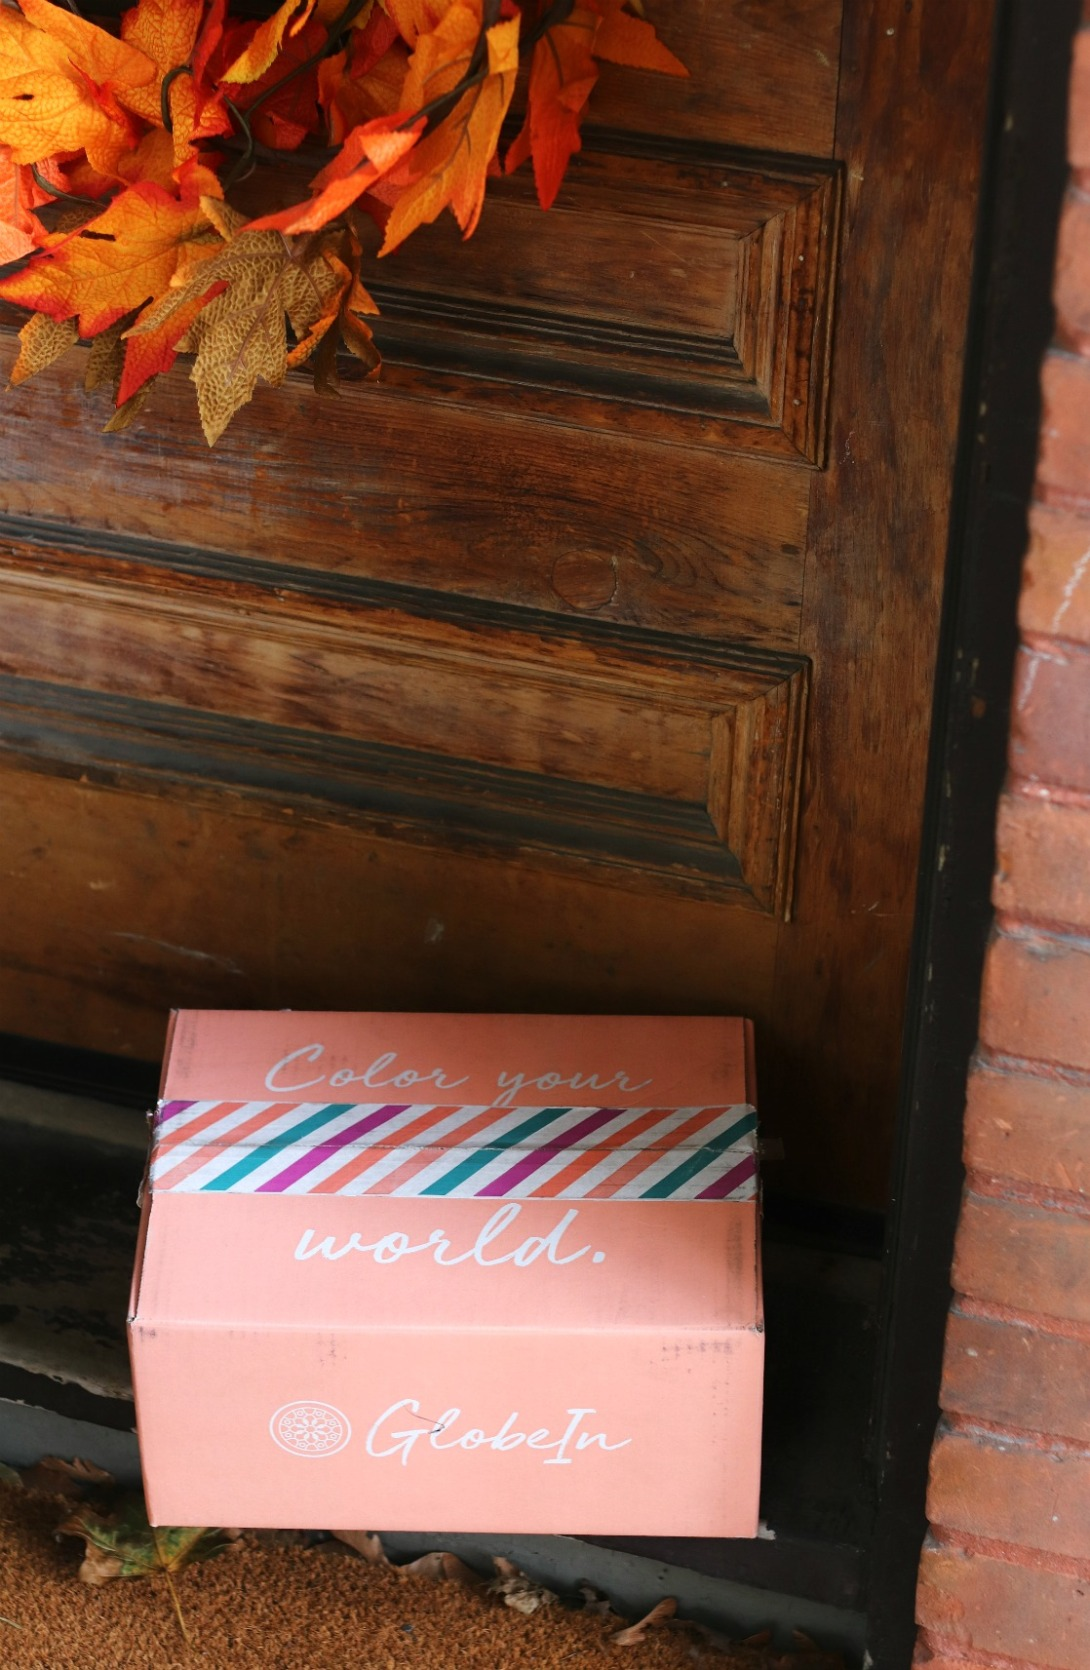 GlobeIn Oct 19 the box